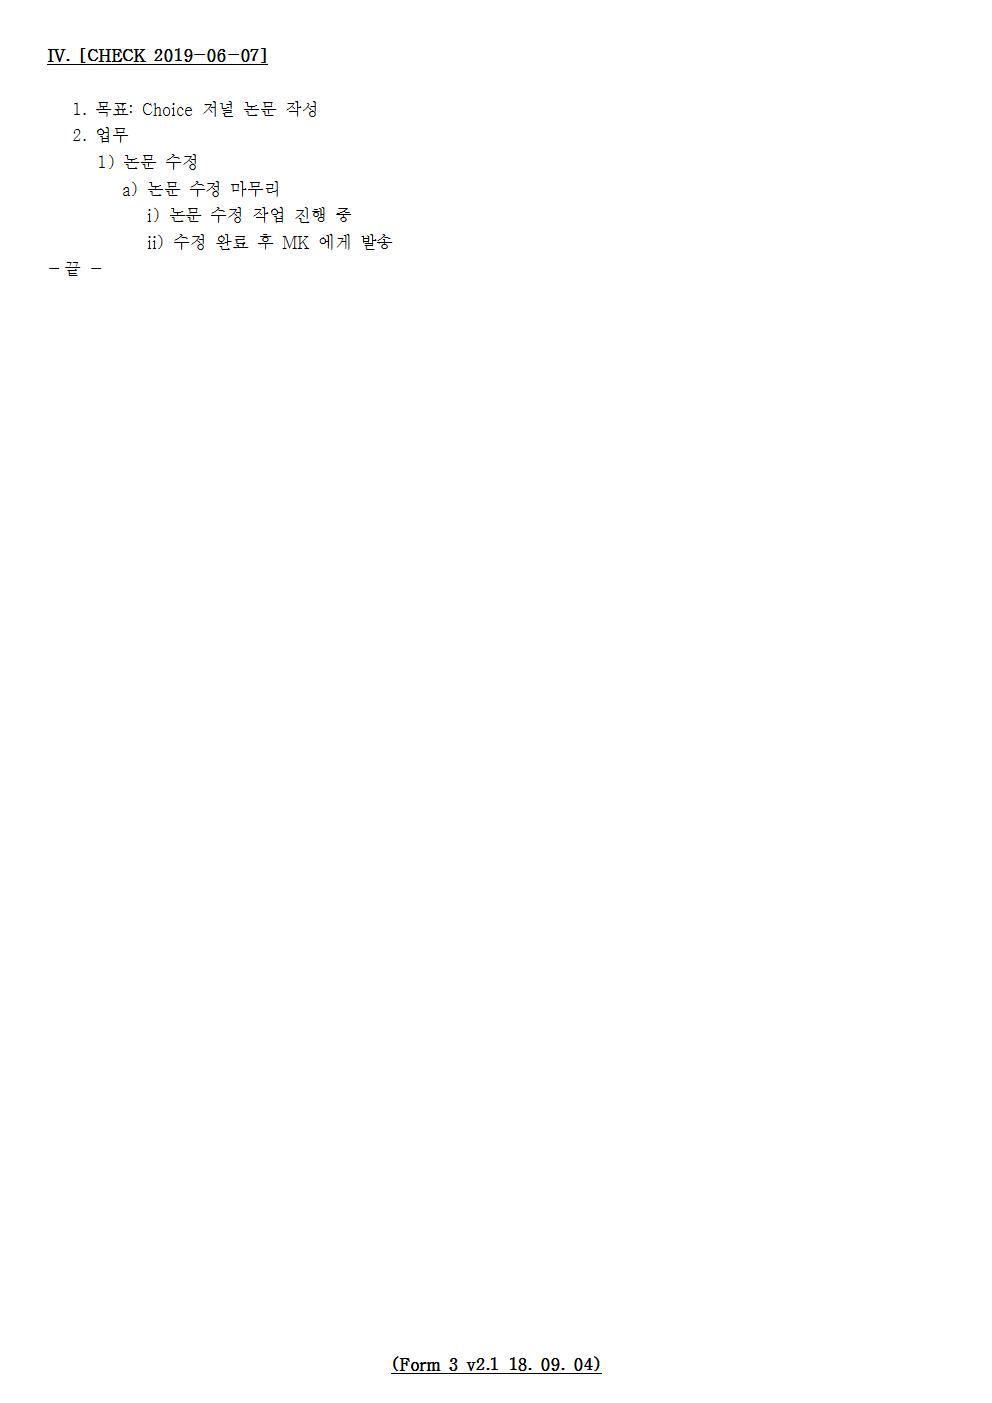 D-[19-011-PP-03]-[Choice Journal]-[2019-06-07][YB]-[19-6-1]-[P+D+C]002.jpg